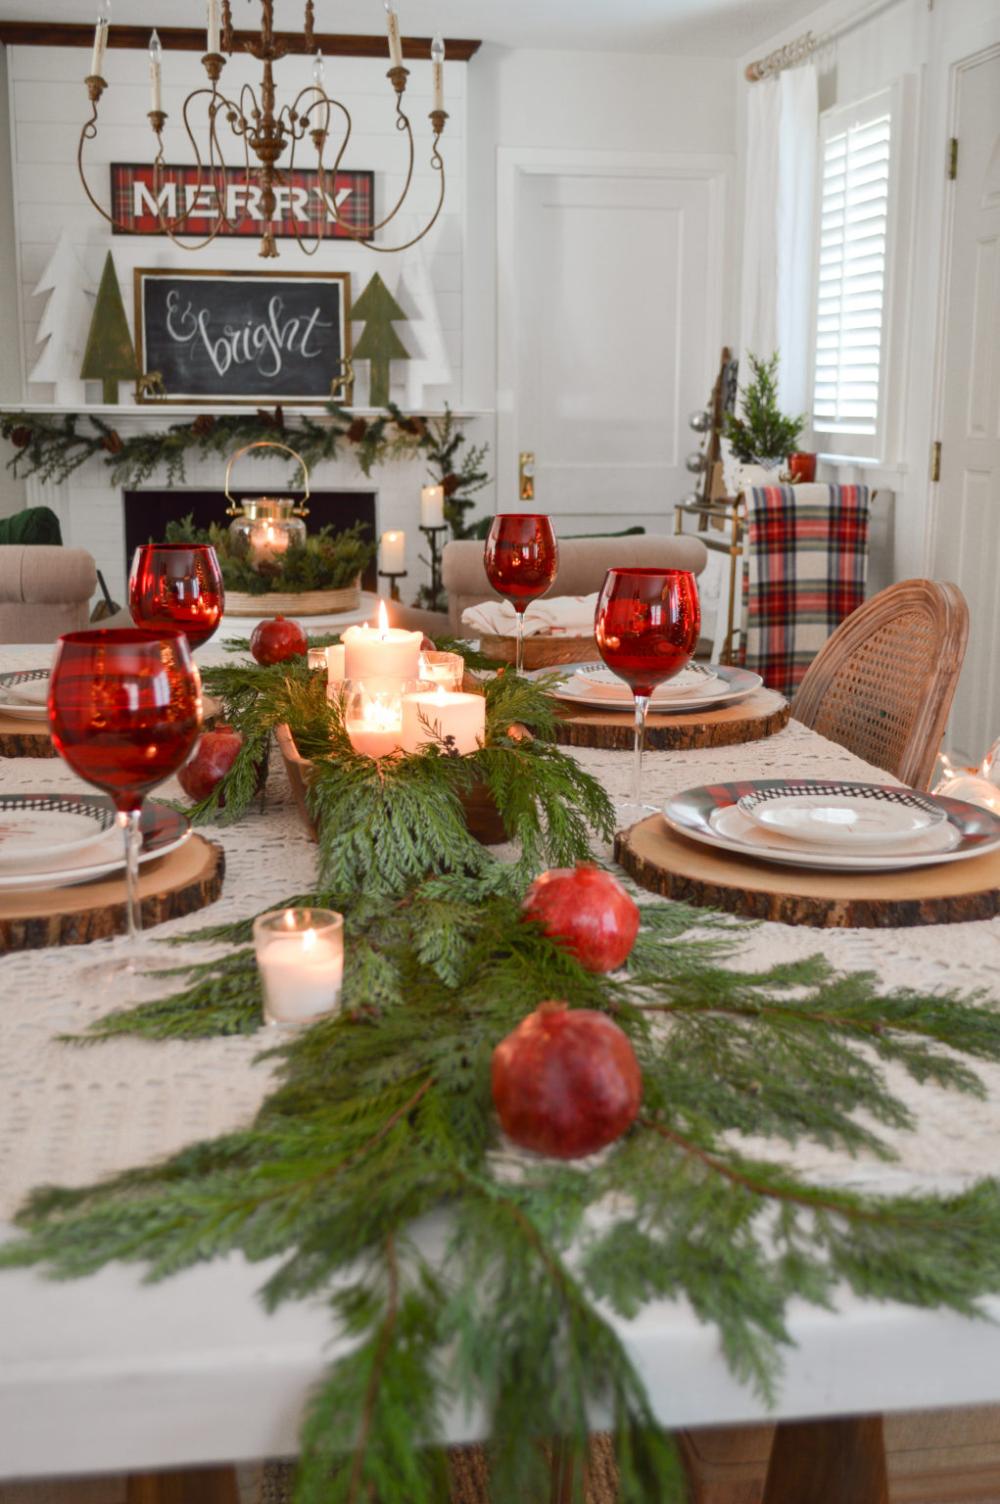 Simple Fresh Cedar Plaid And Pomegranate Christmas Table Cottage Farmhouse Style Christmas Dinner Table Christmas Table Decorations Holiday Table Settings